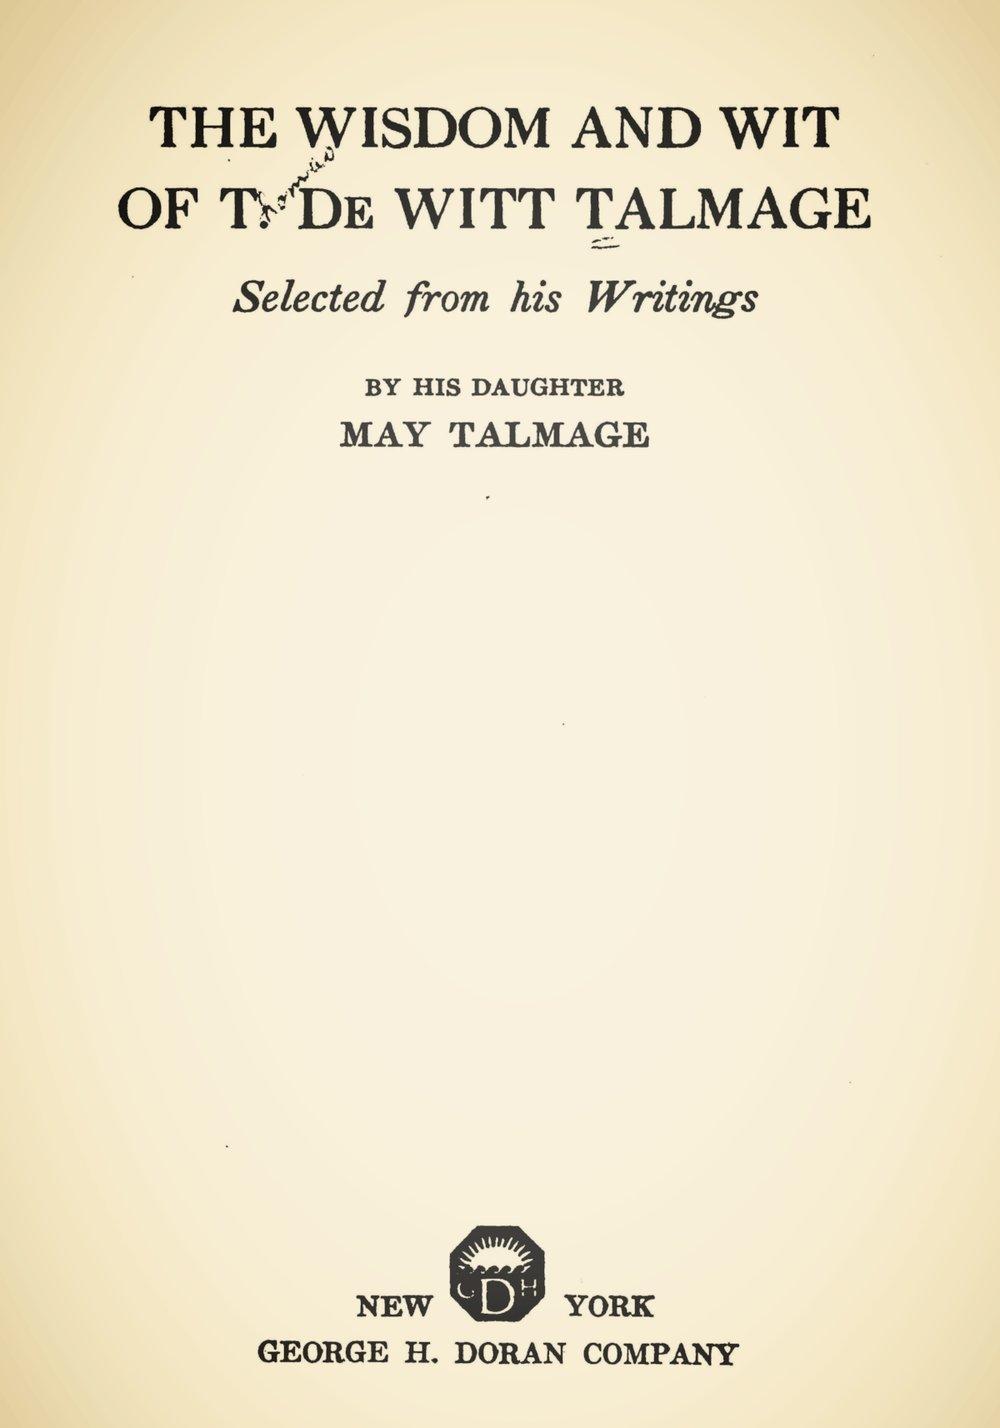 Talmage, Thomas De Witt, The Wit and Wisdom of T. De Witt Talmage Title Page.jpg